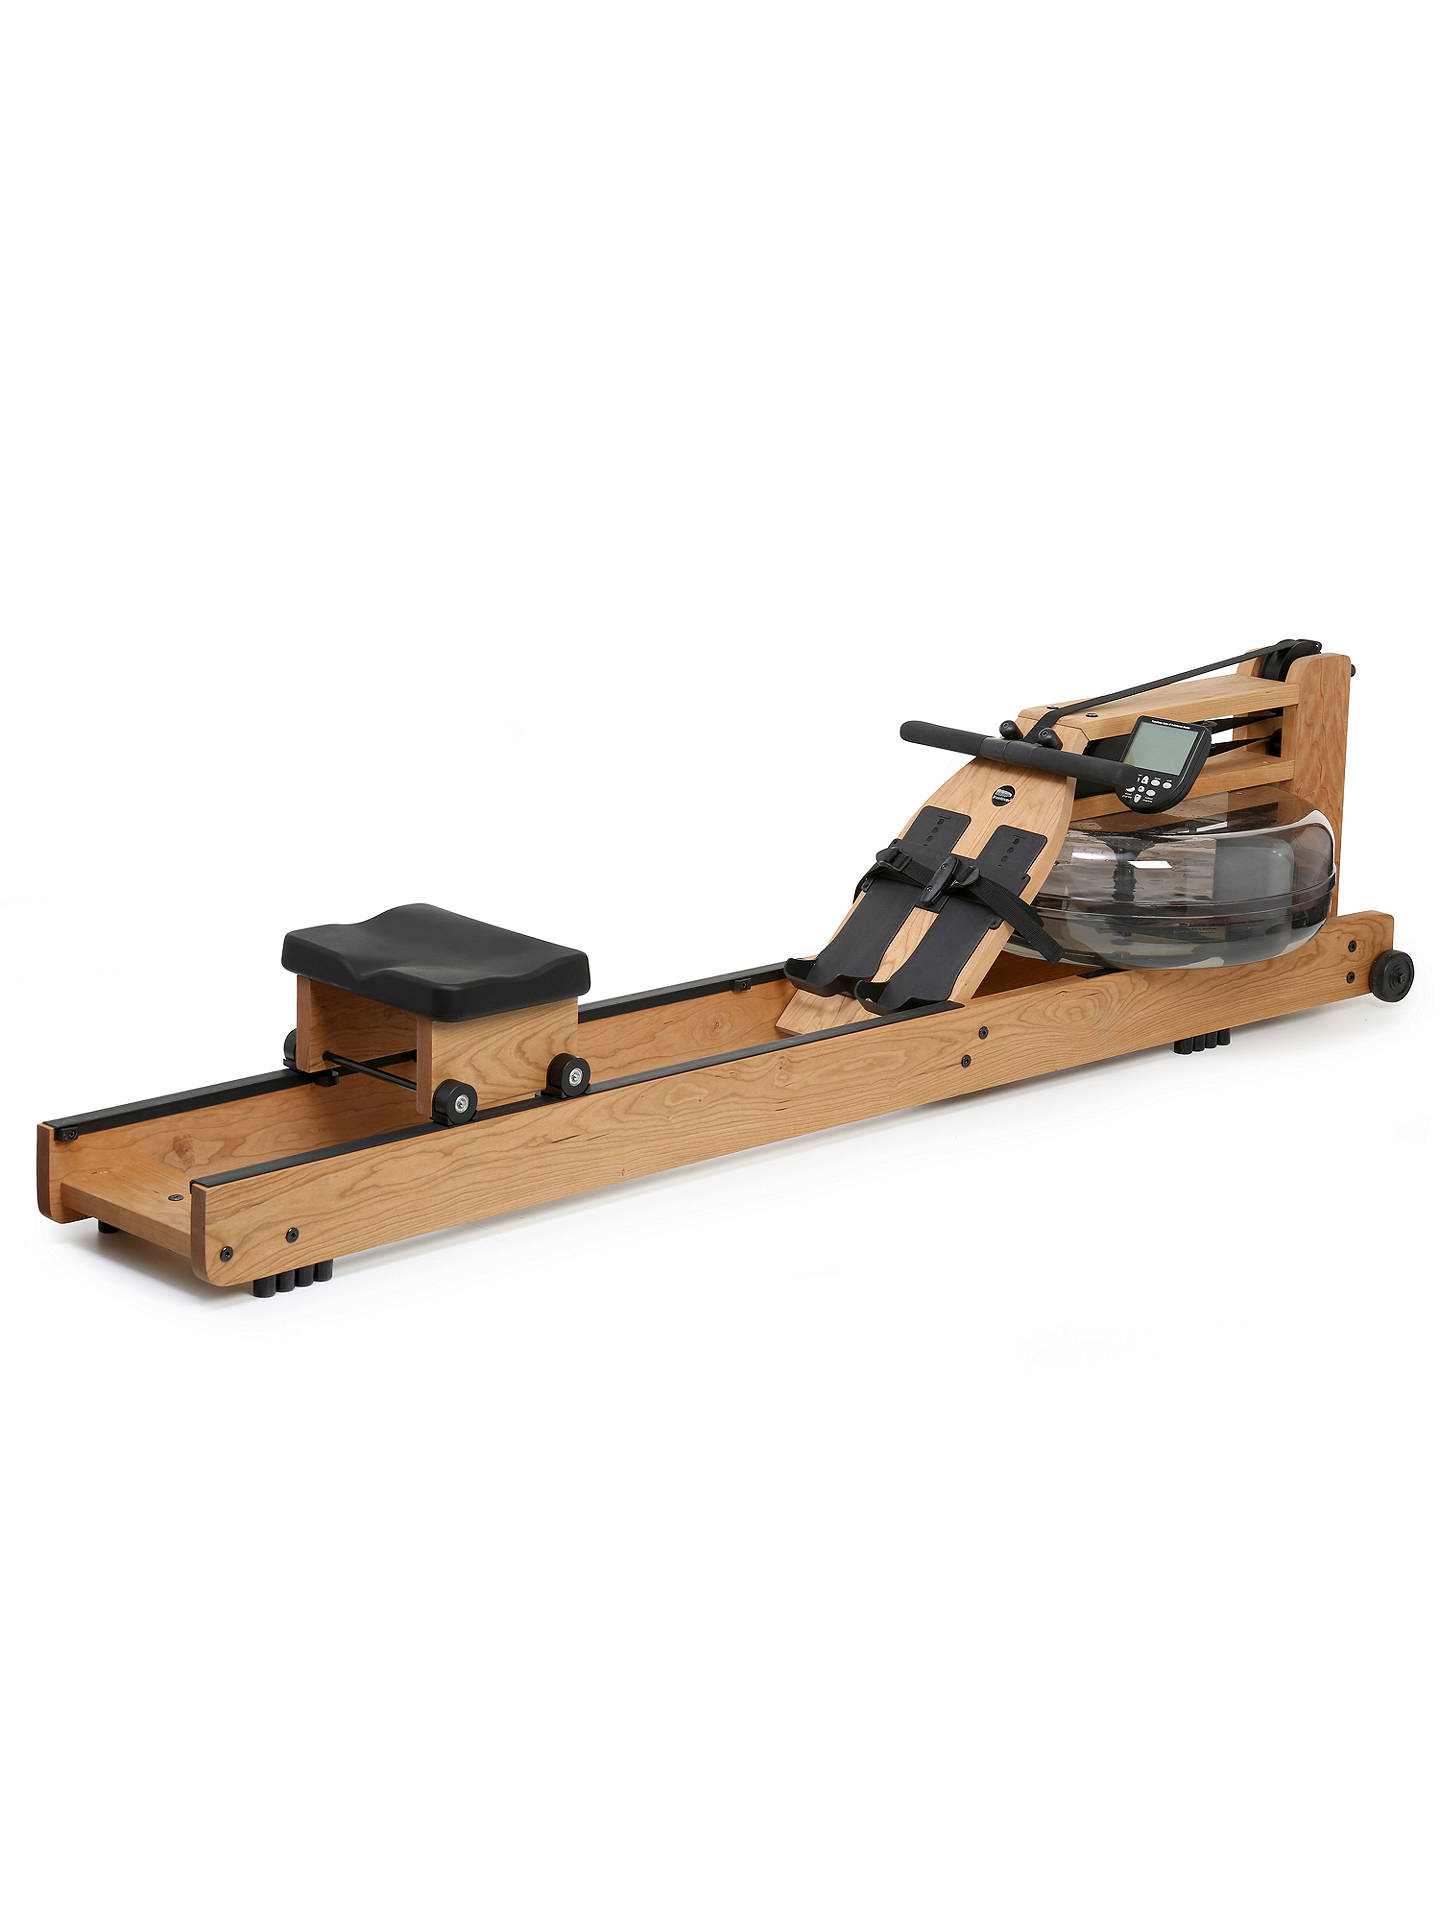 waterrower oxbridge rowing machine with s4 performance monitorbuy waterrower oxbridge rowing machine with s4 performance monitor, cherry wood online at johnlewis